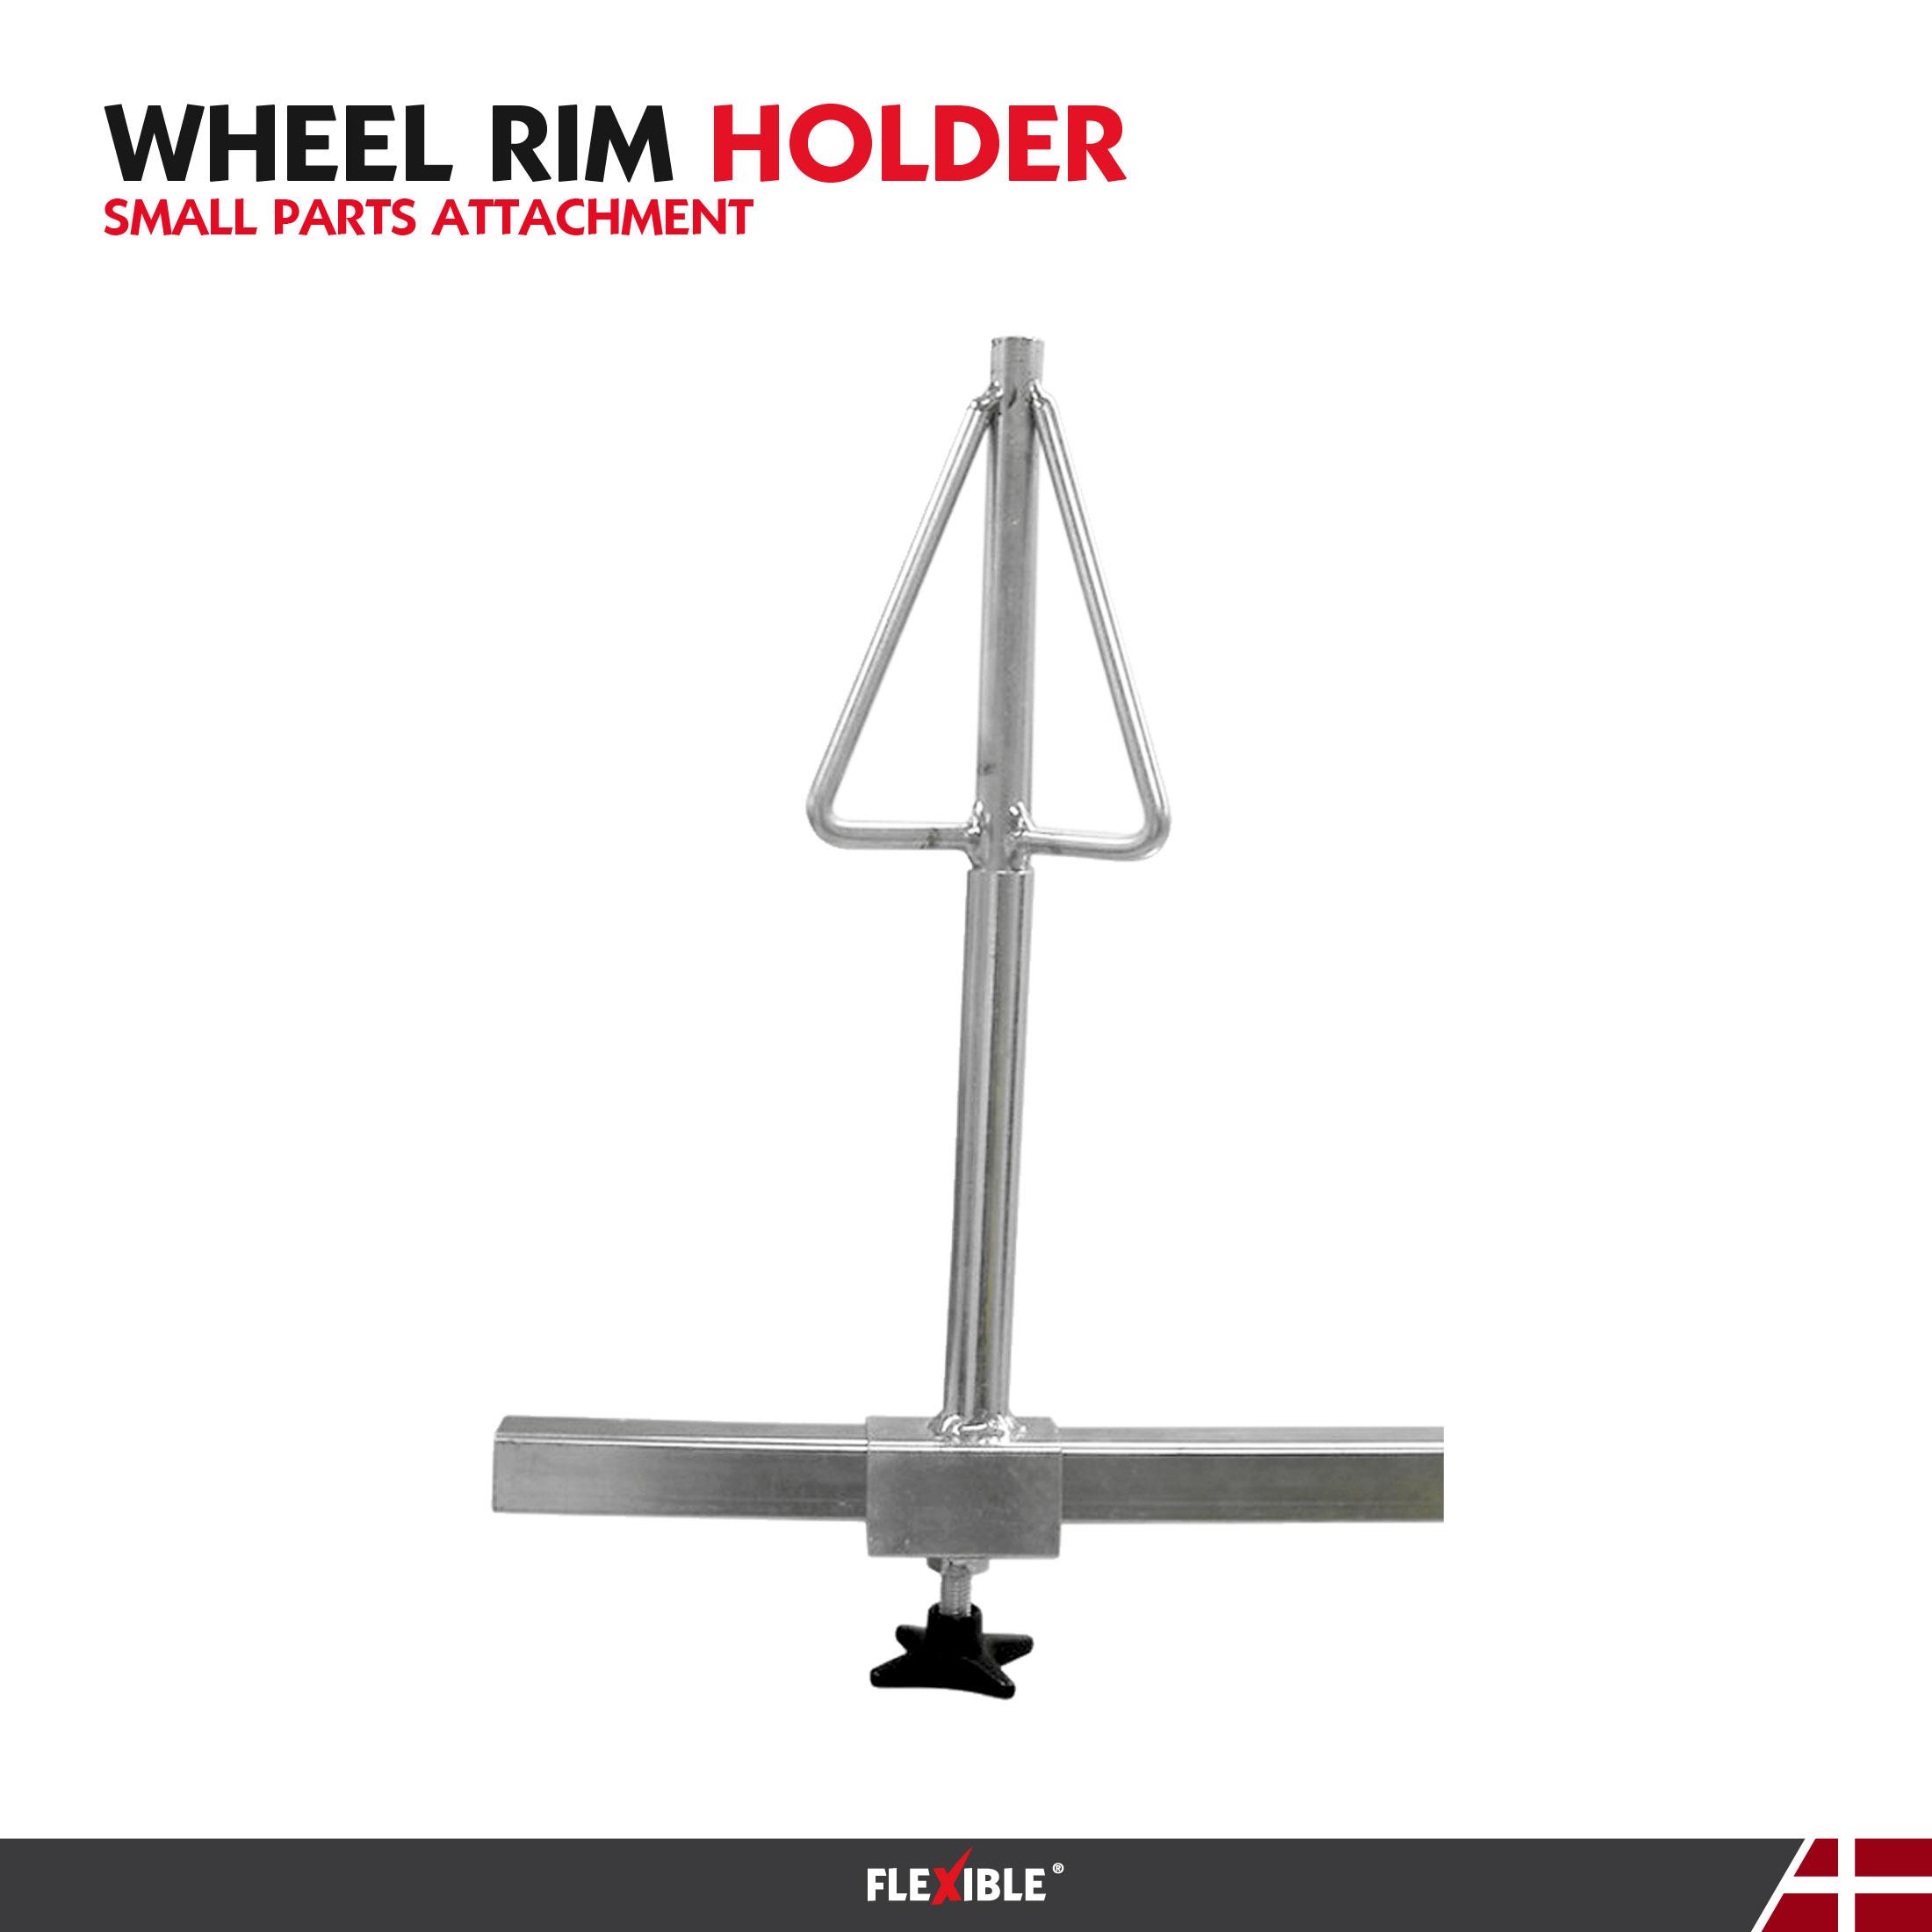 wheel rim holder attachemnt tool